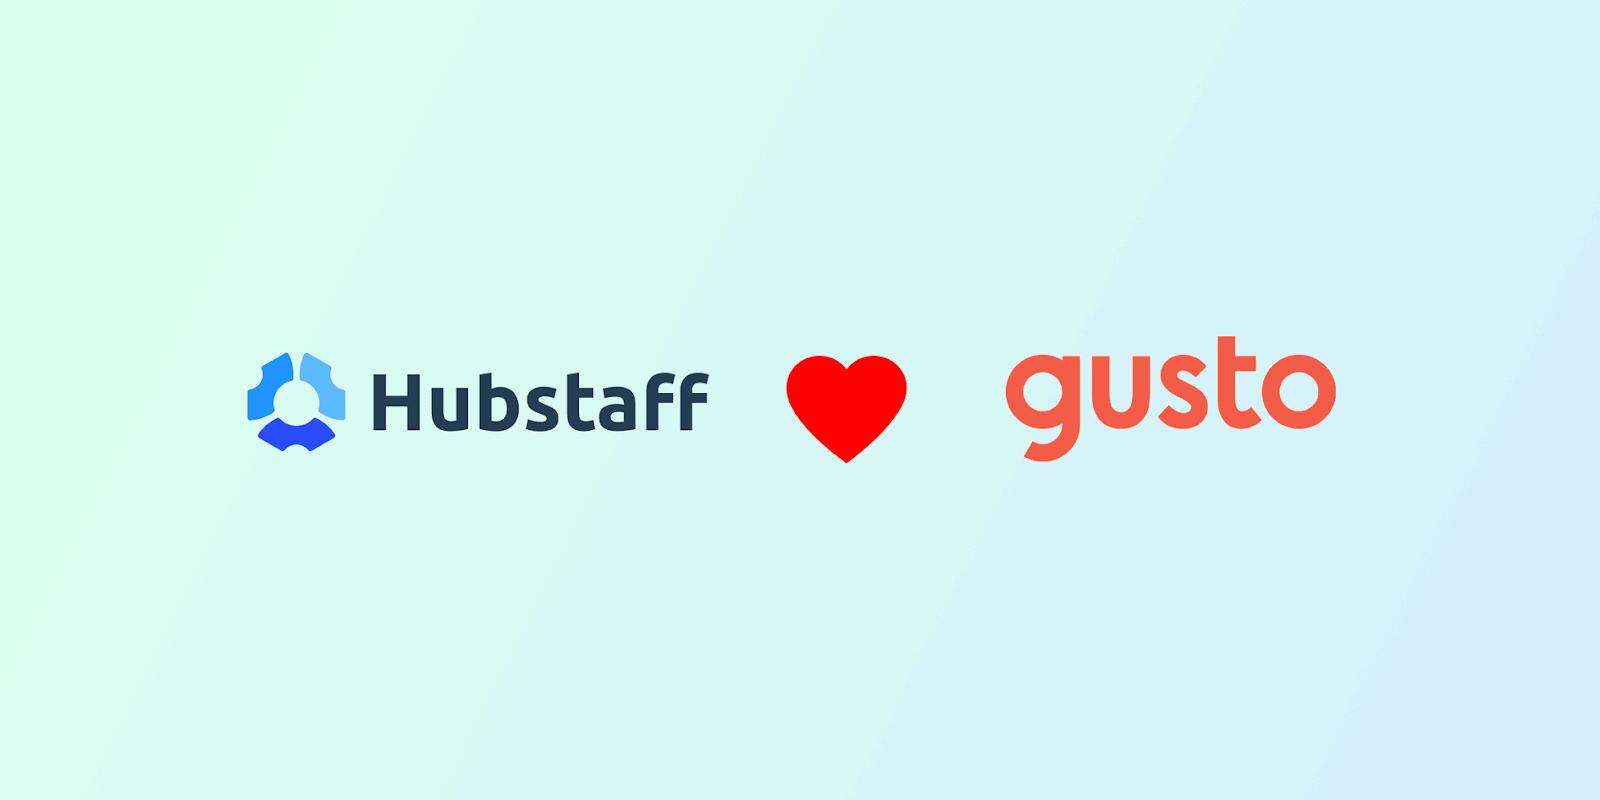 Hubstaff and Gusto